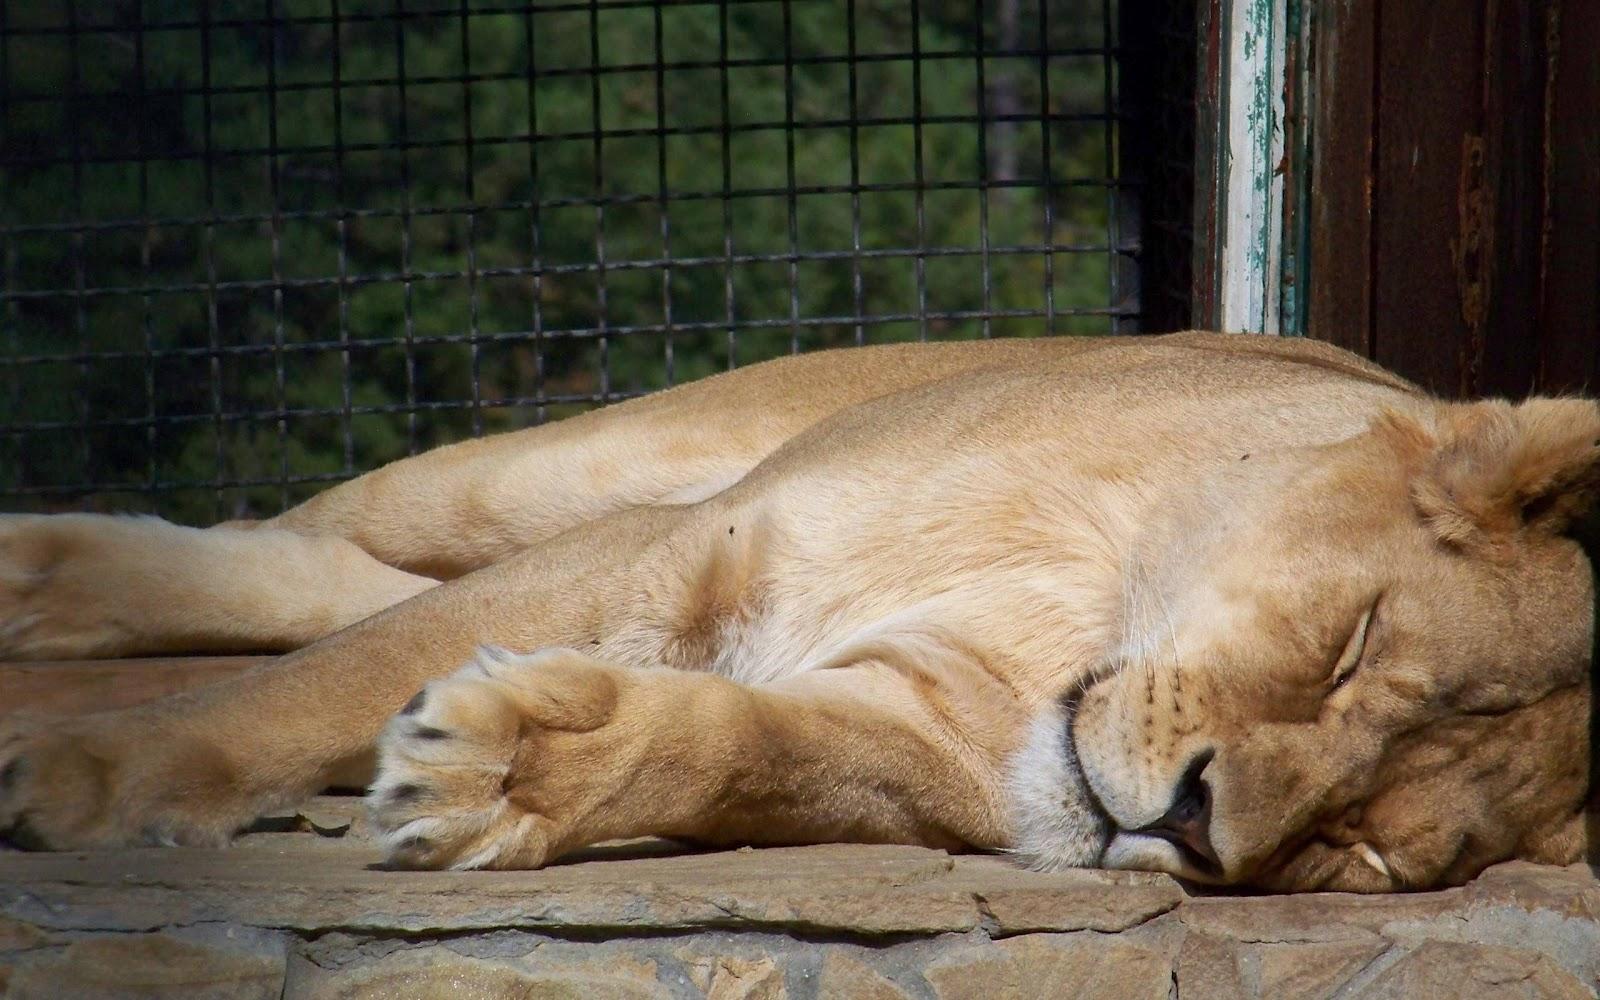 sleeping lion wallpaper background